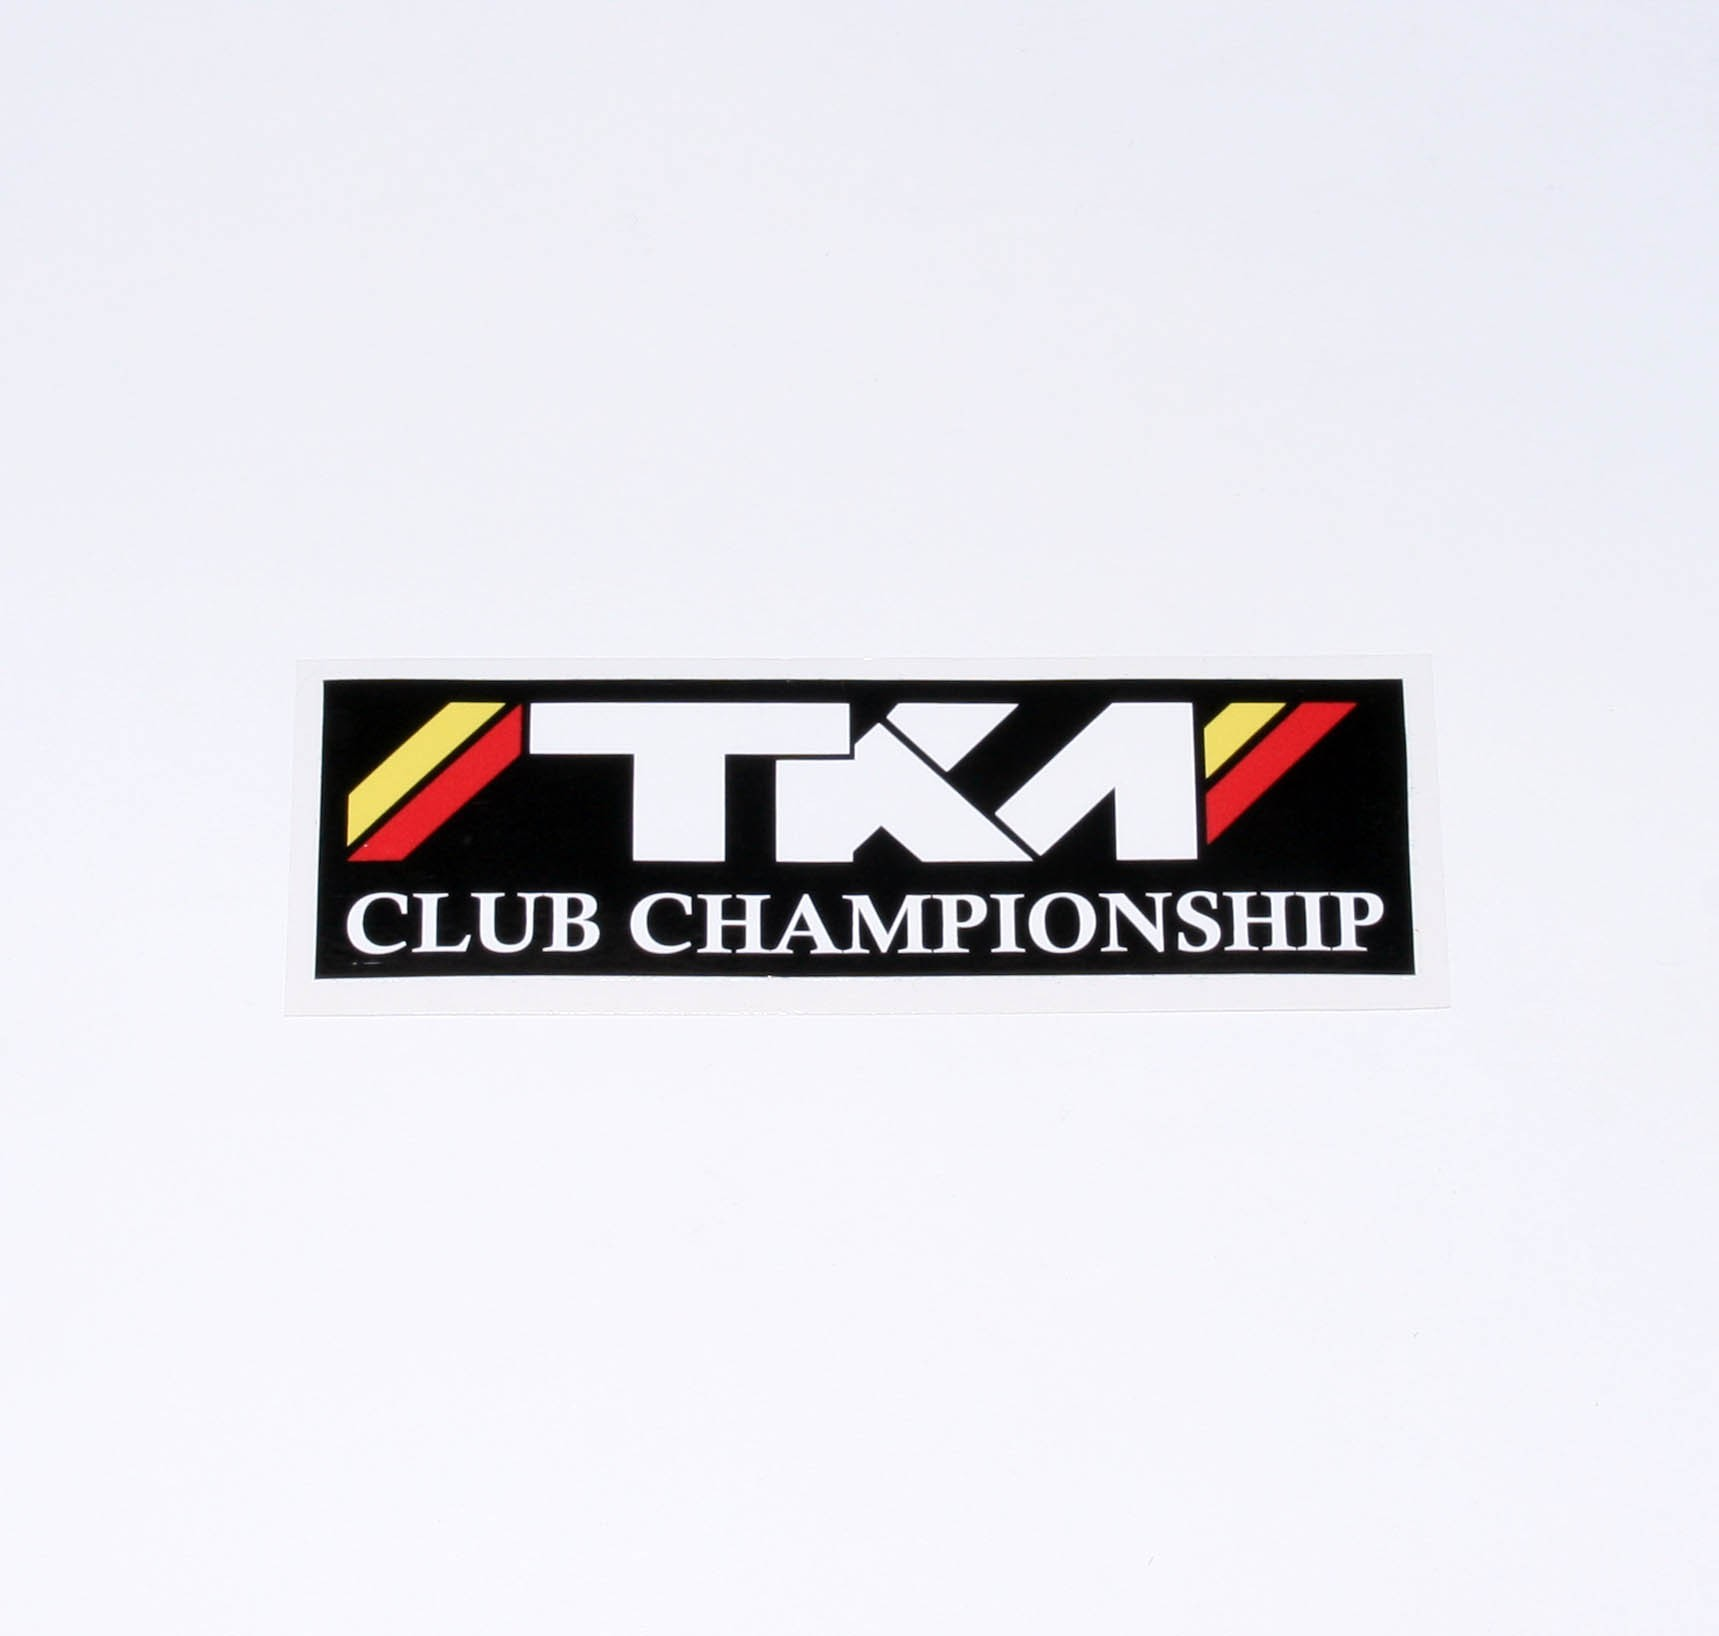 TKM CLUB CHAMP STICKER DECAL132 x 39